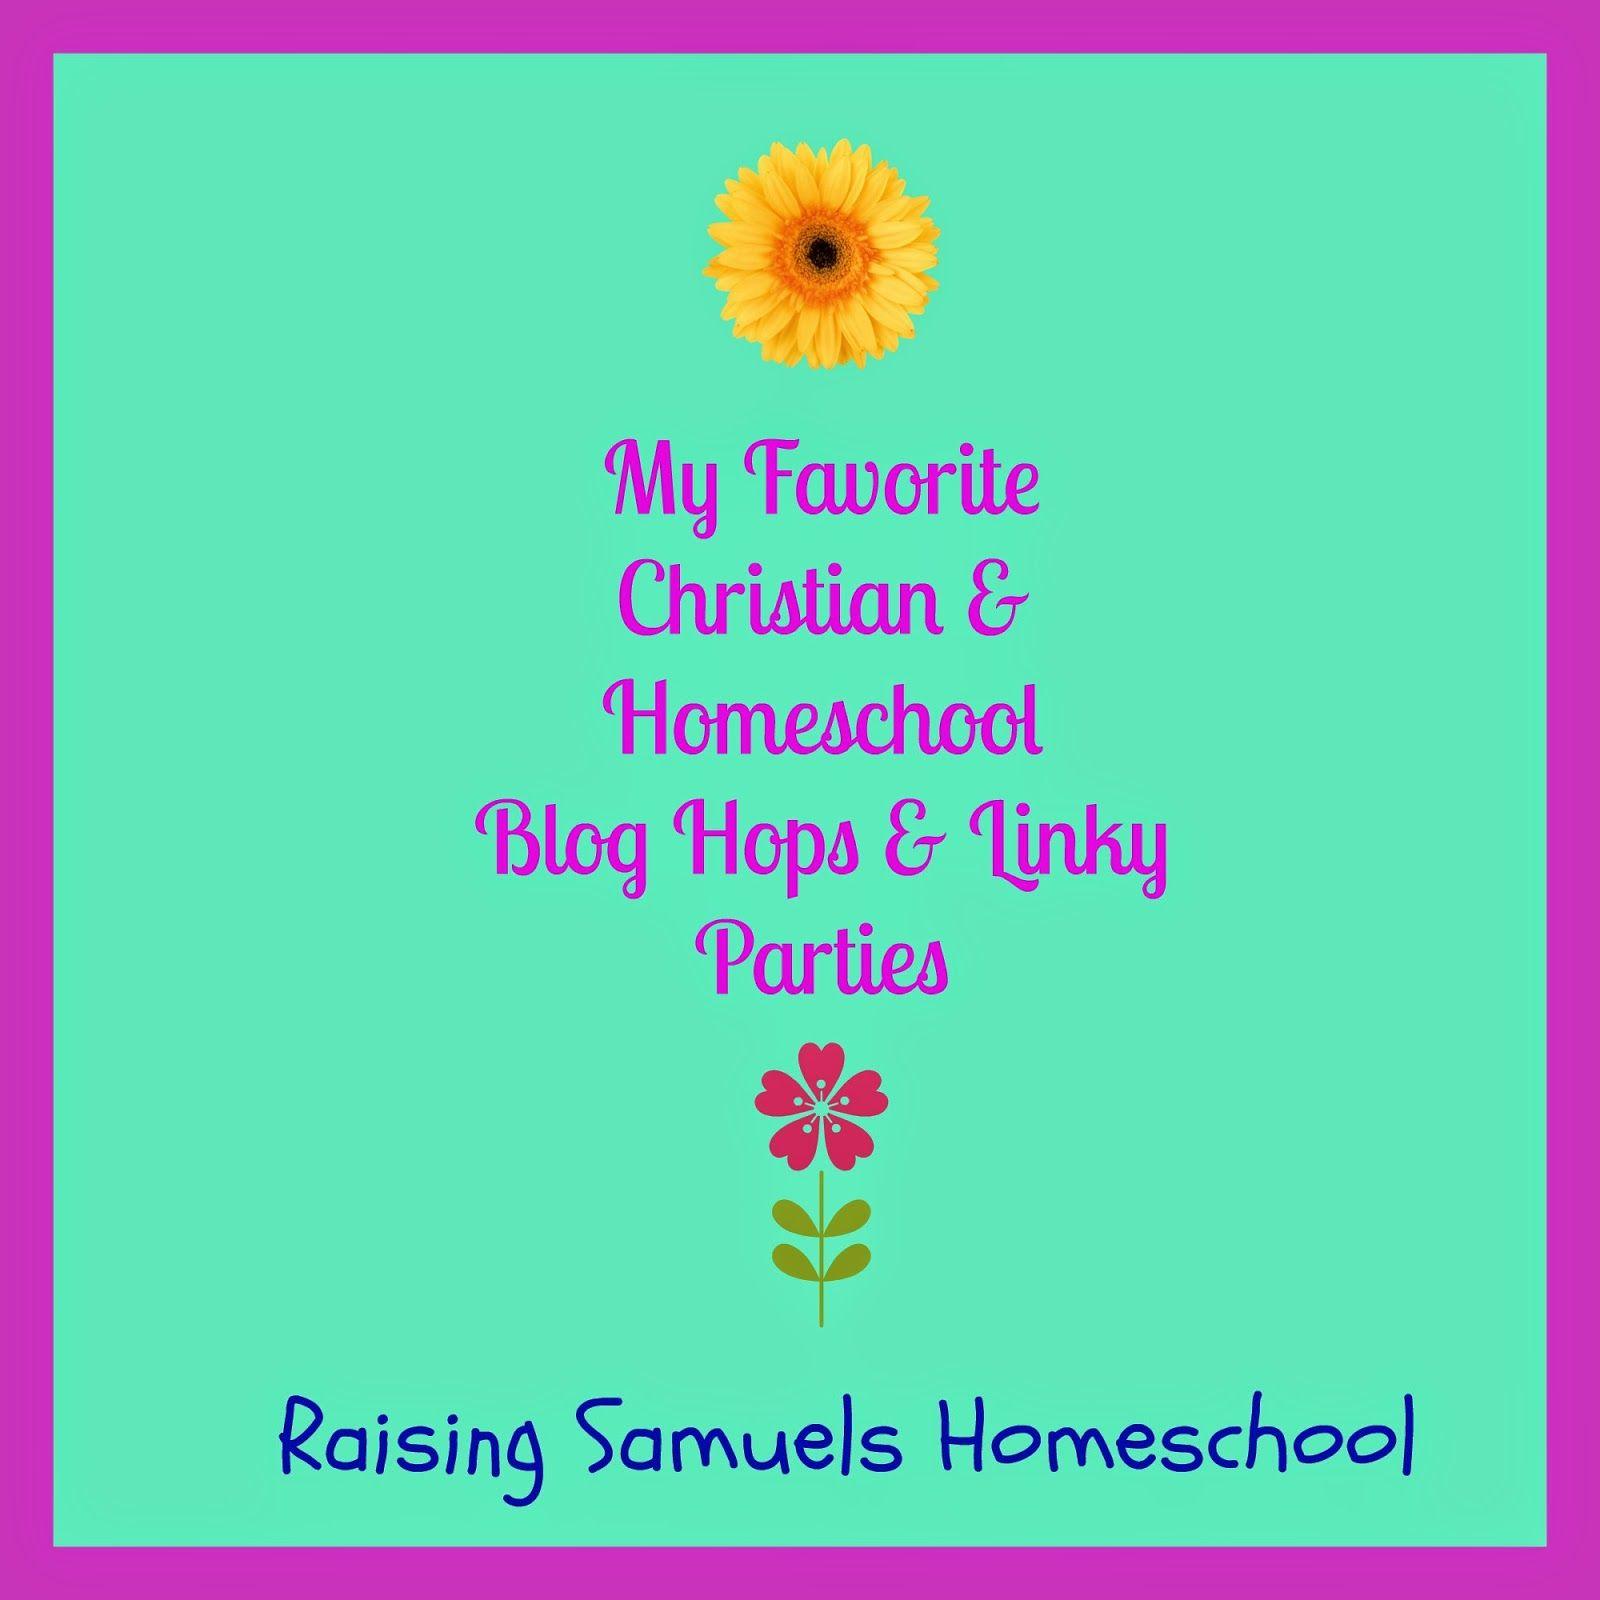 My Favorite Christian & Homeschool Blog Hop & Linky Parties